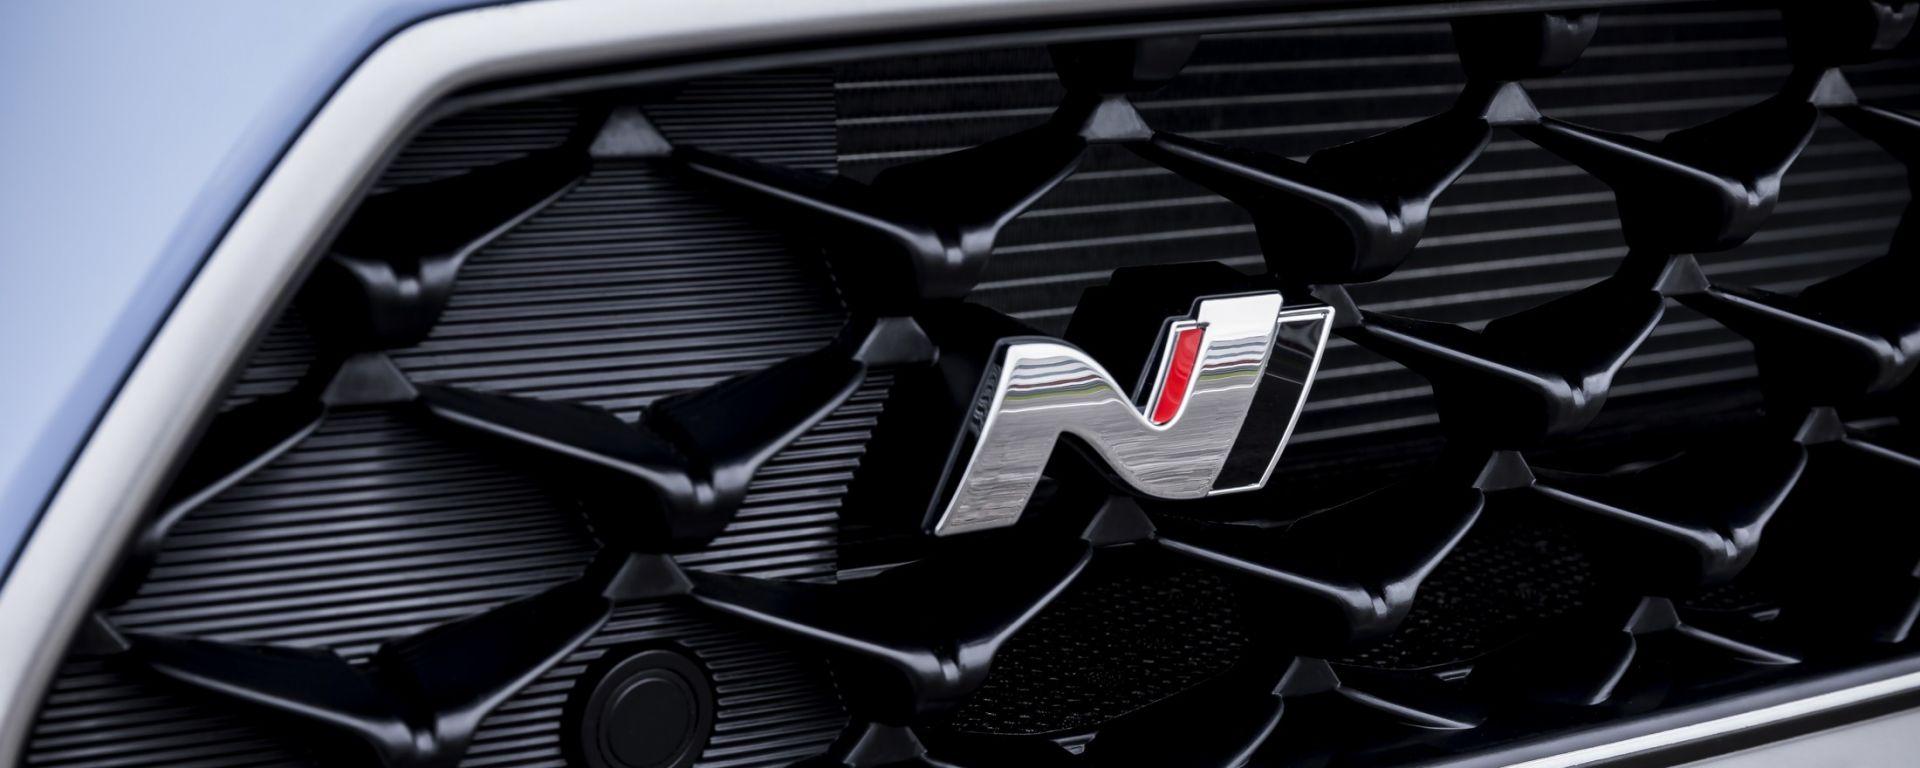 Hyundai i20 N: arriverà nel 2020 con oltre 200 cv